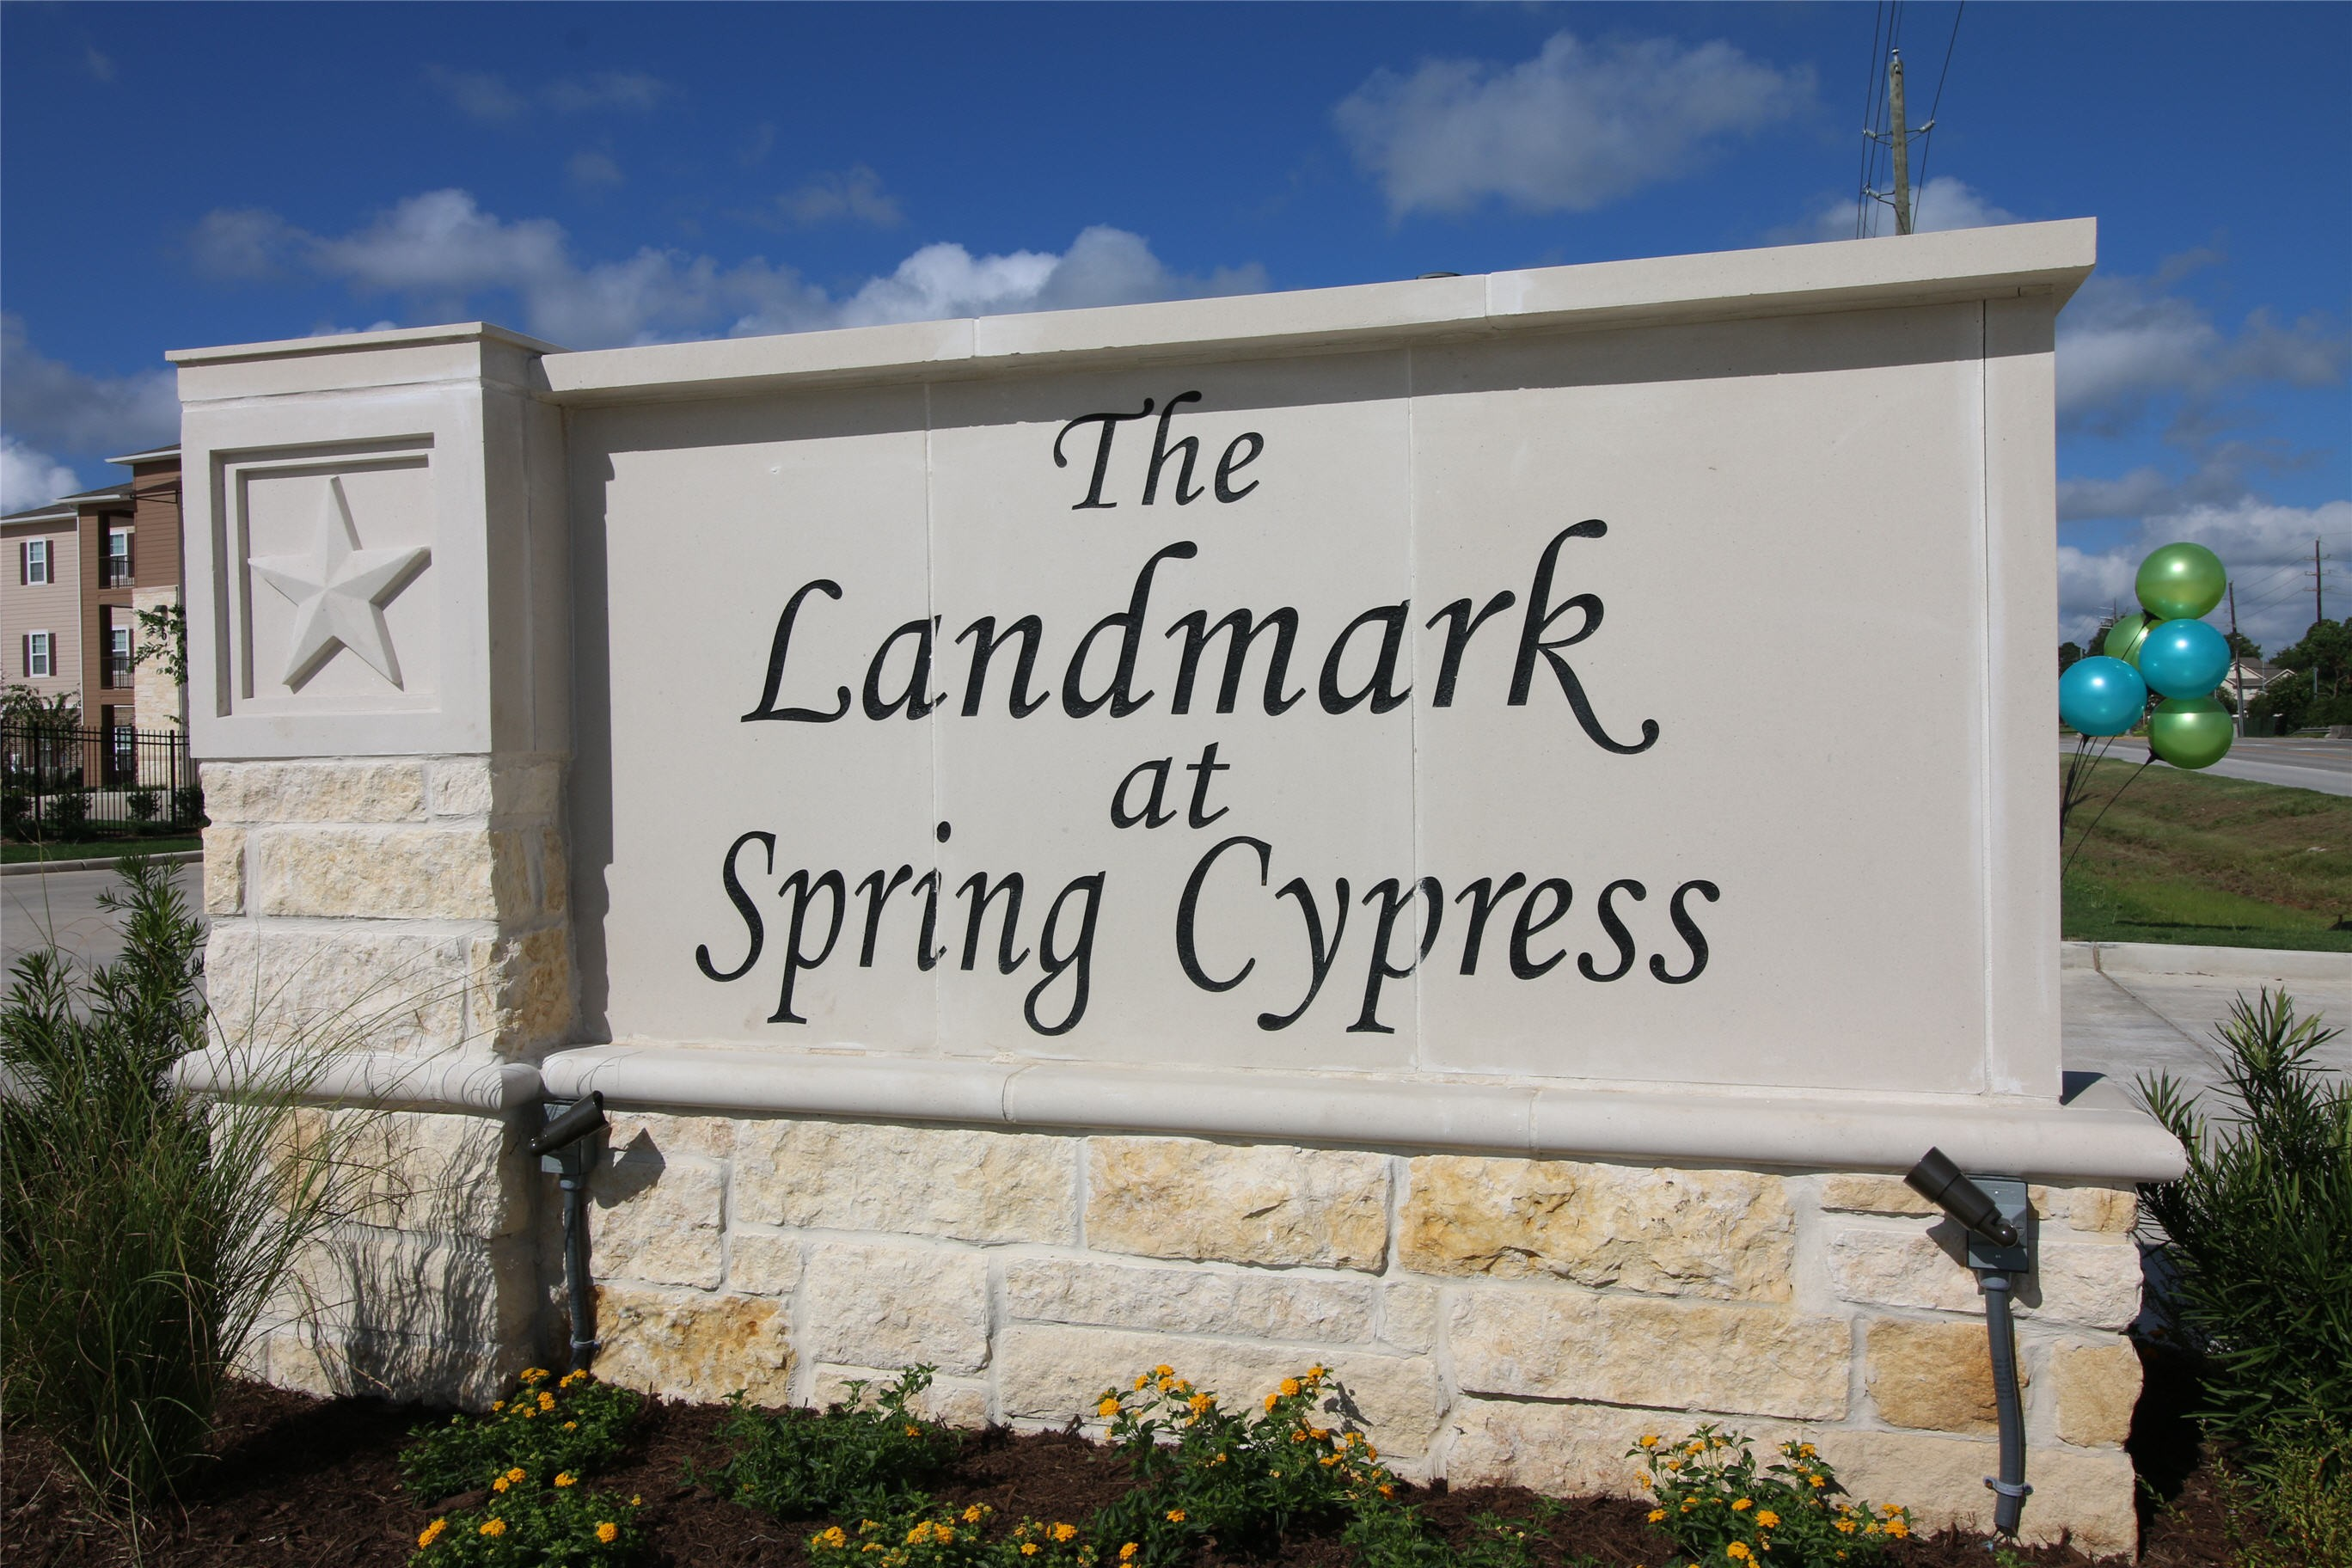 Landmark at Spring Cypress